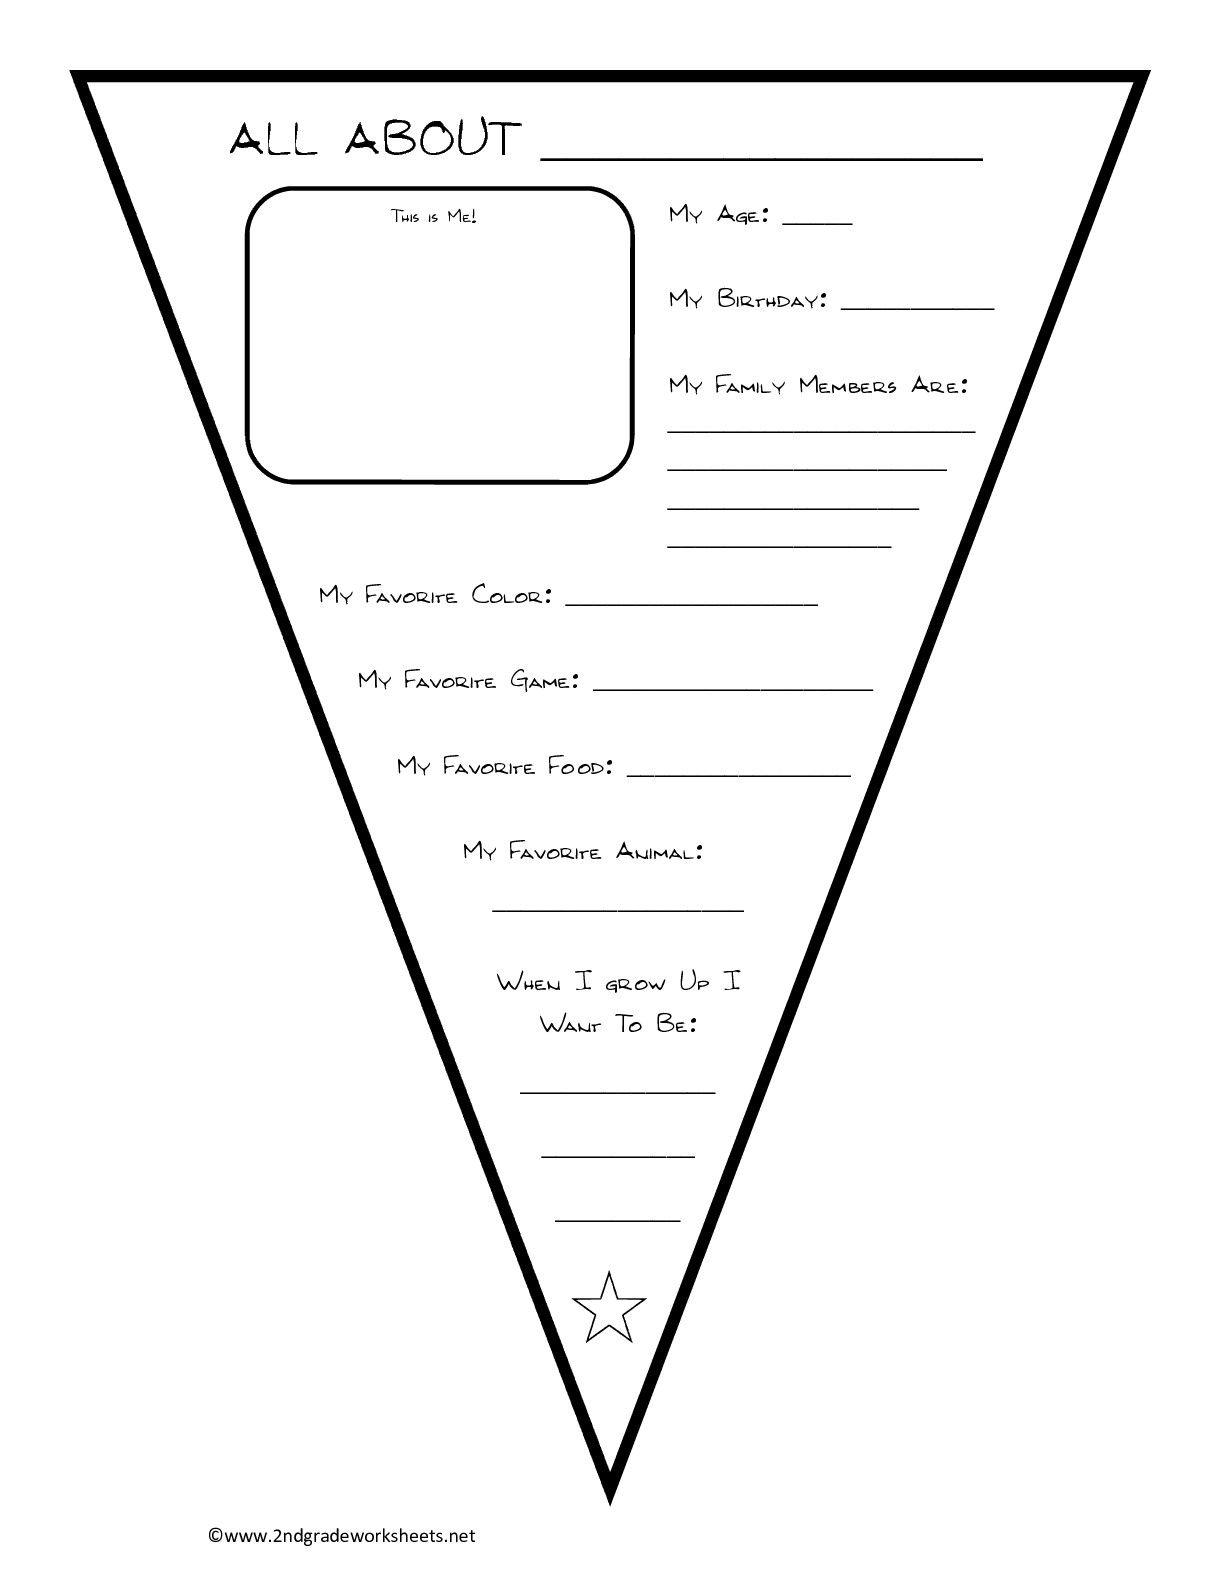 Printable All About Me Worksheet 11 1 224 1 584 Pixels